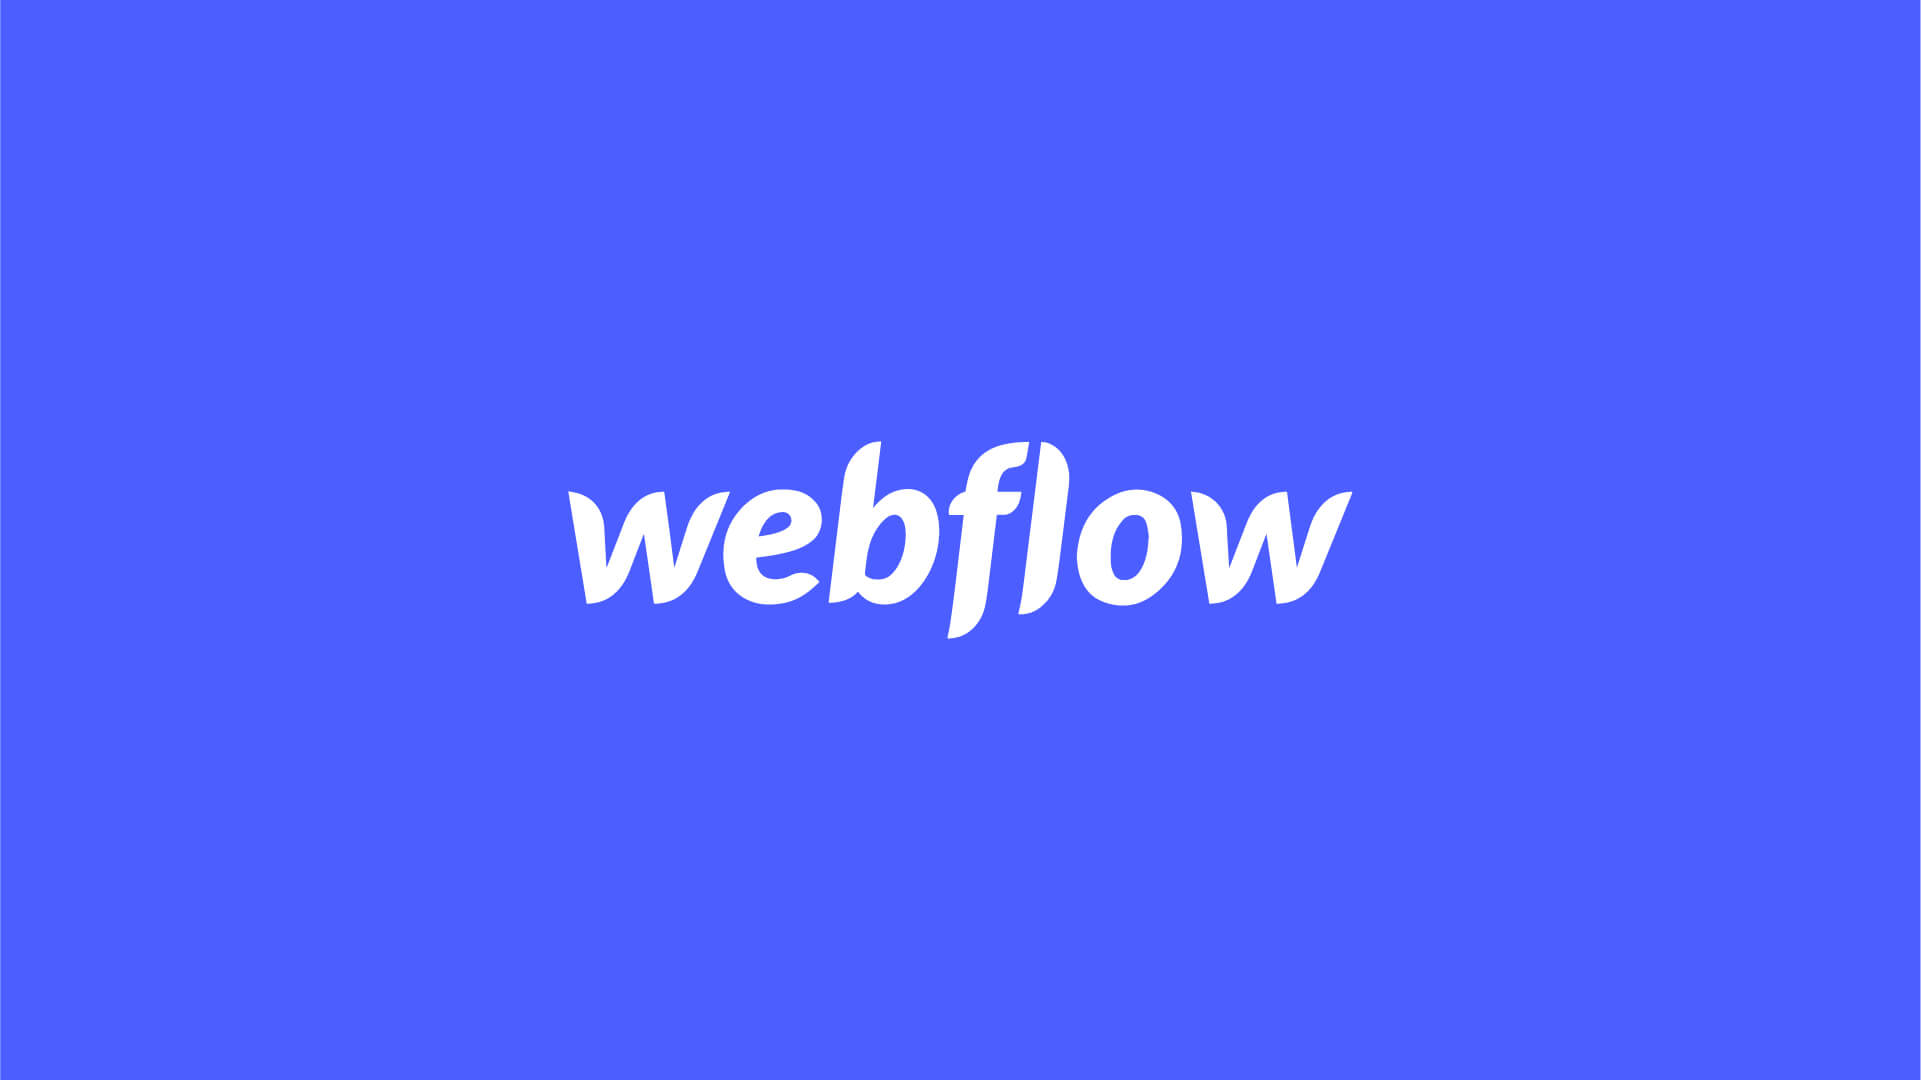 Webflow logo on a blue background